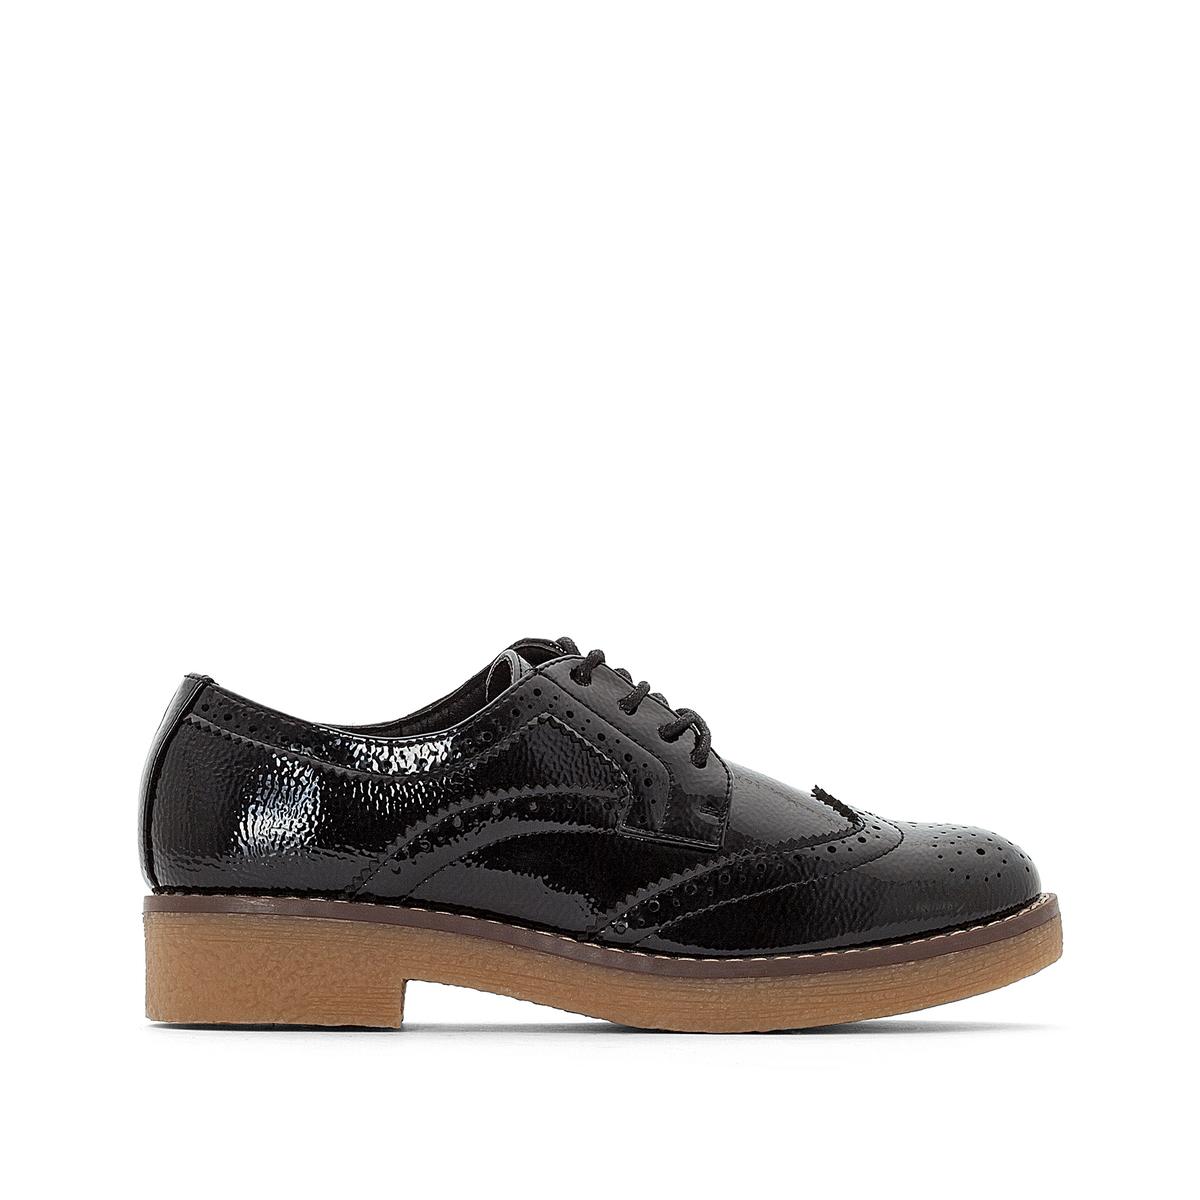 Ботинки-дерби из кожи с подошвой из крепа ботинки дерби из мягкой кожи takarika